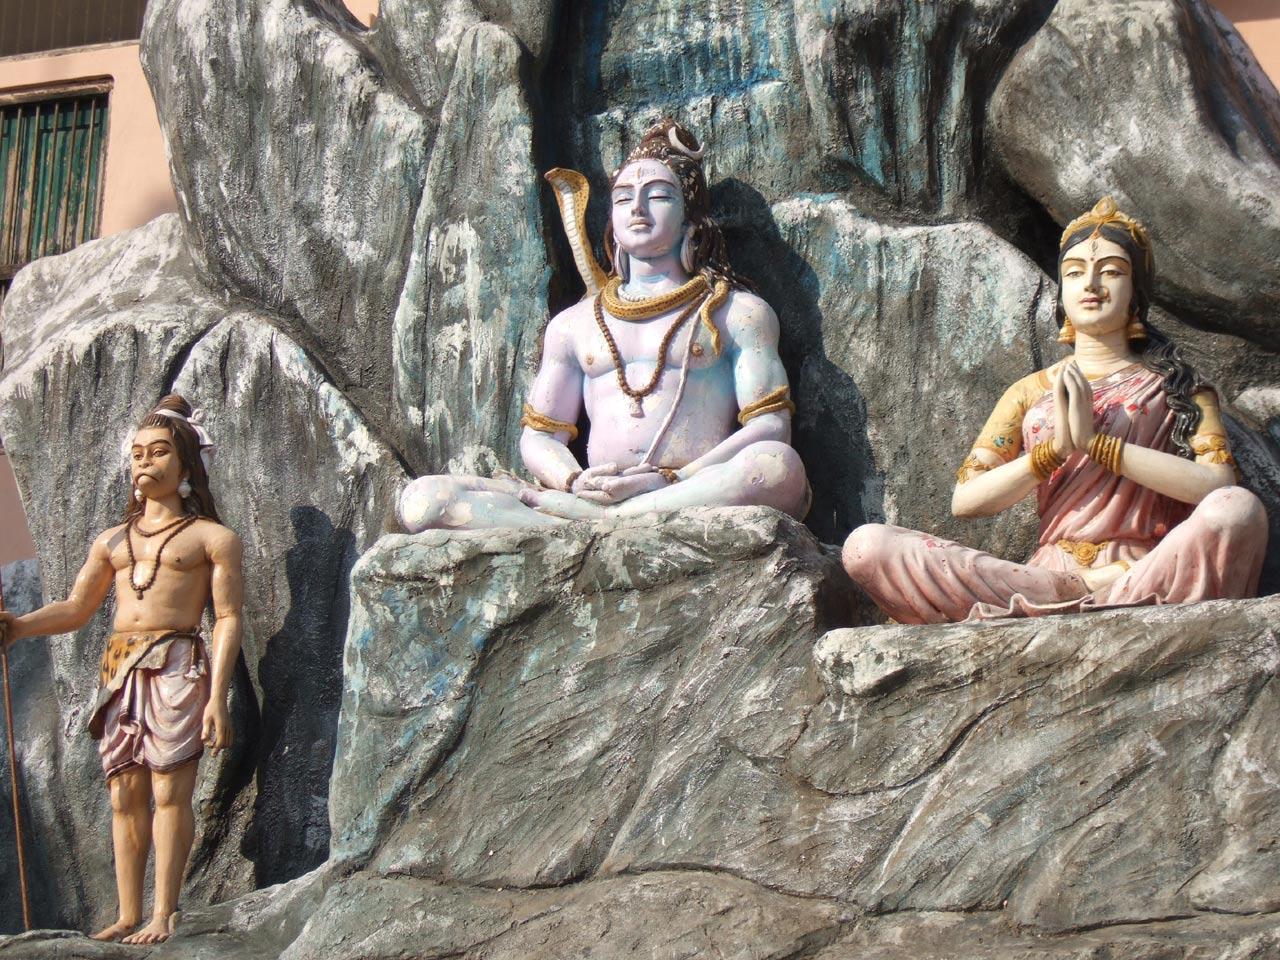 Hindu Gods And Goddesses Statues